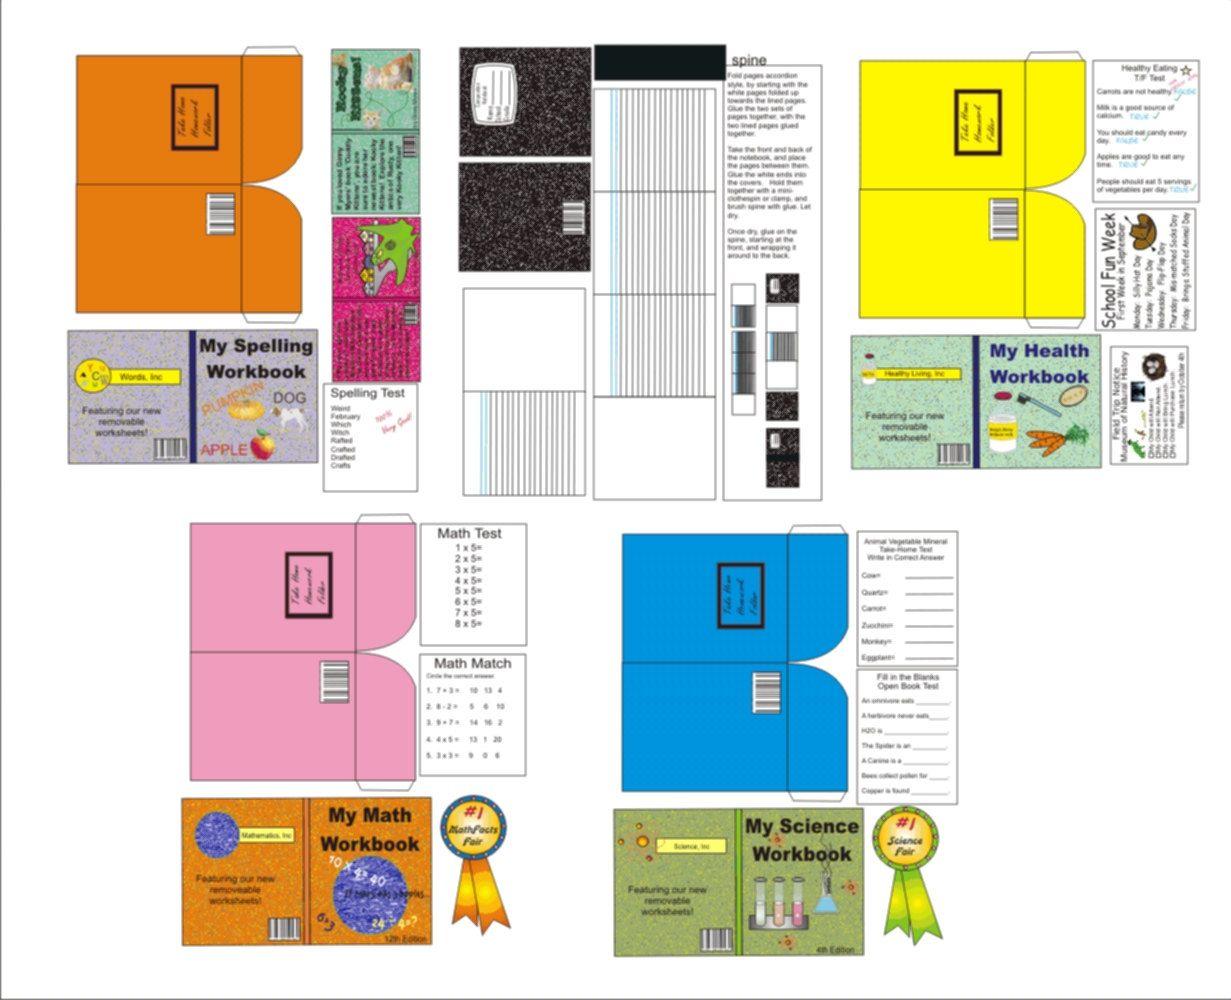 331296116315217166 on 6 Math Worksheet Printable For Sch